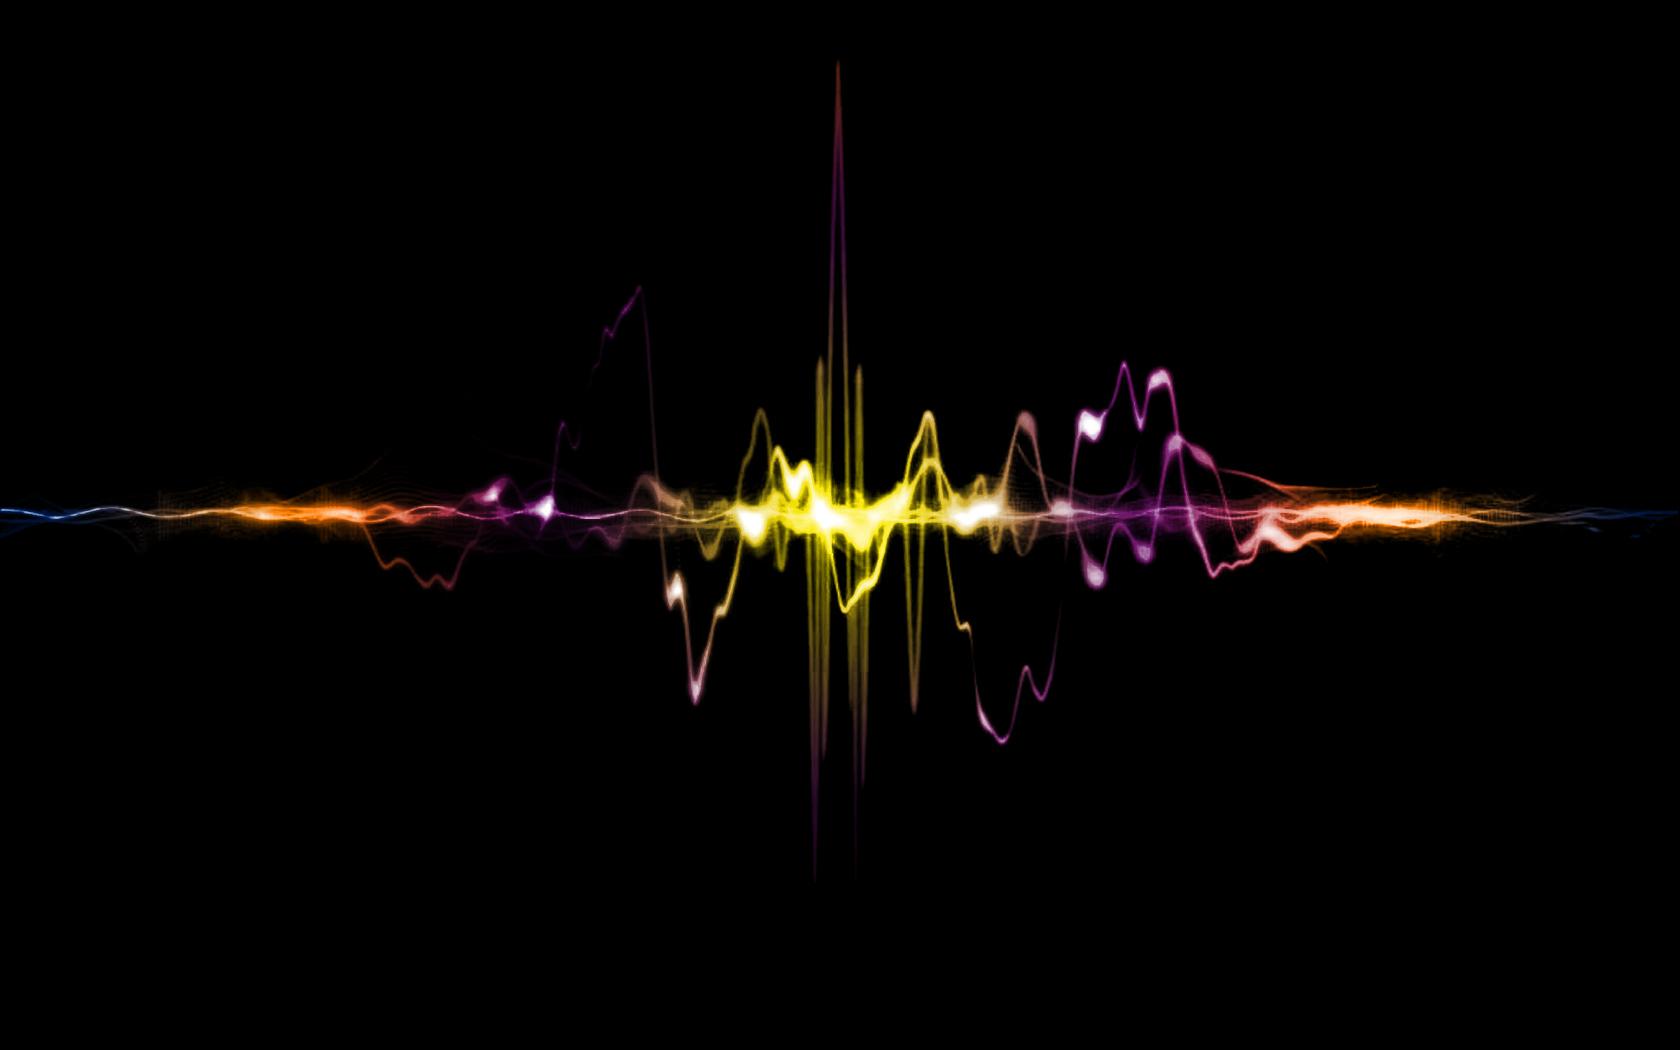 Waves Sound Wallpaper 1680x1050 Waves Sound Oscilloscope 1680x1050